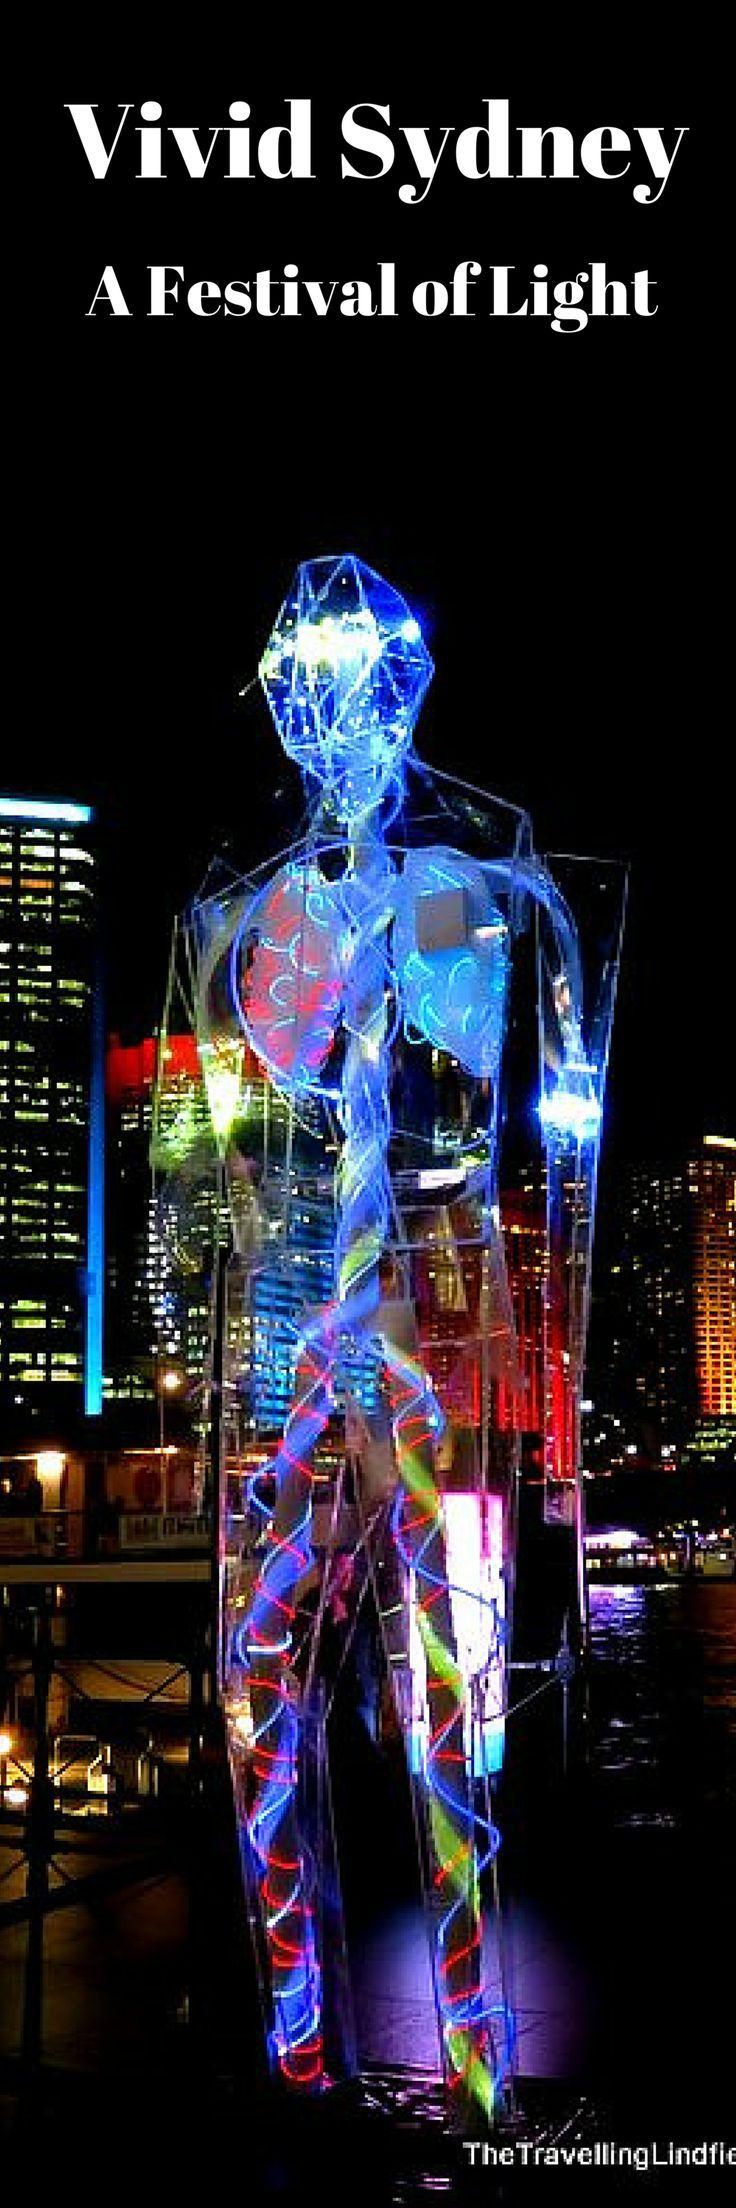 Vivid Sydney: Lights, camera, action! - http://www.thetravellinglindfields.com/2015/05/vivid-sydney-light-music-and-ideas.html